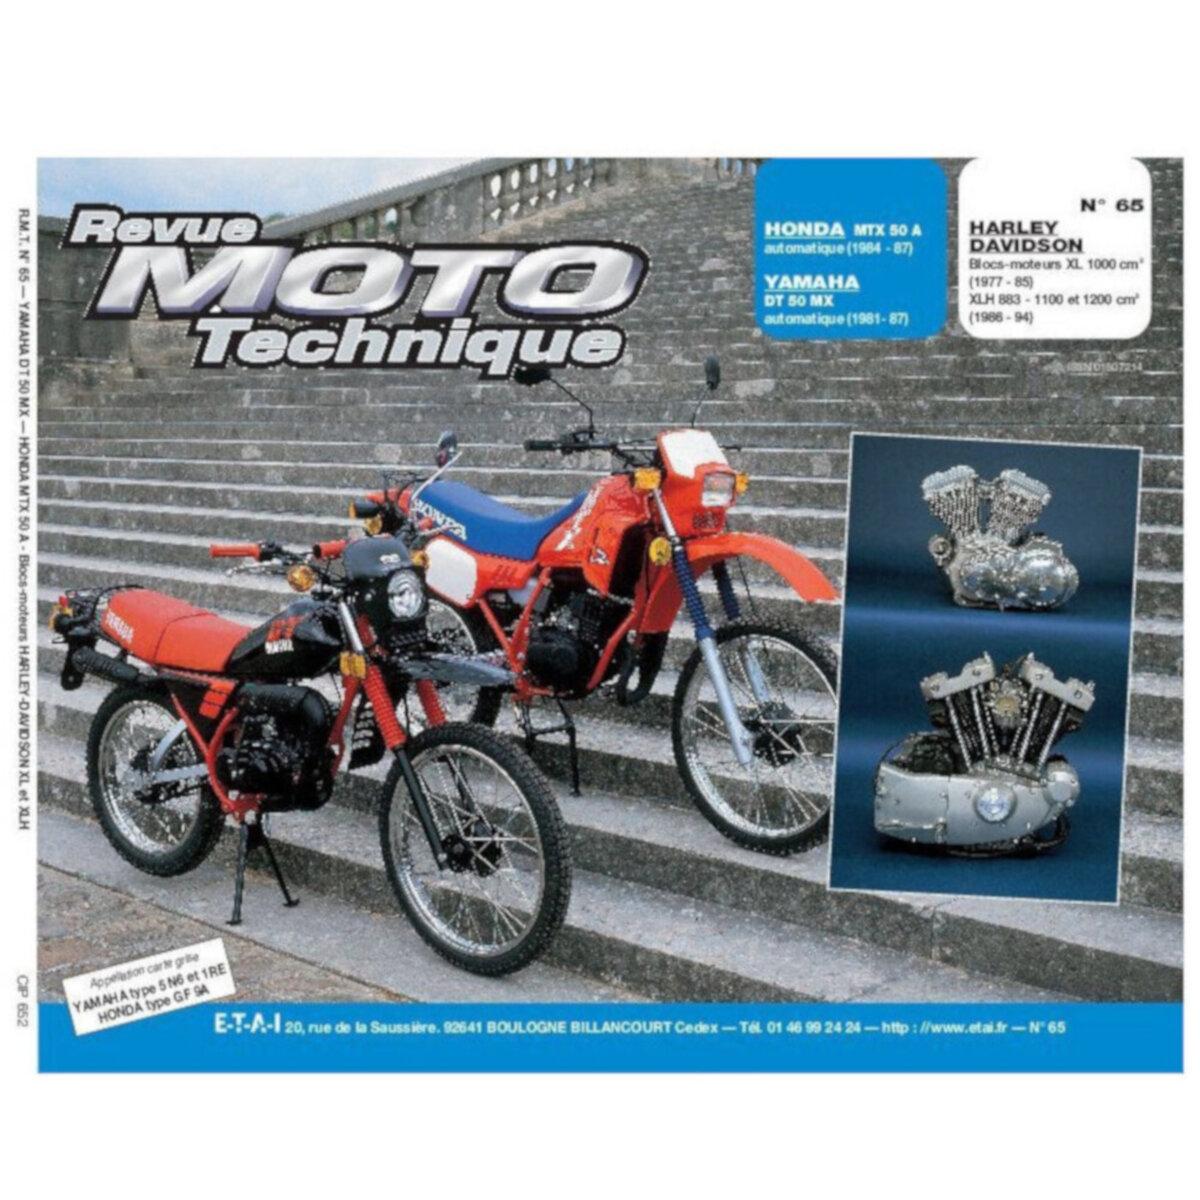 Revue Moto Technique 65.2 Honda MTX 50 / Yamaha DT 50 MX / Harley Davi